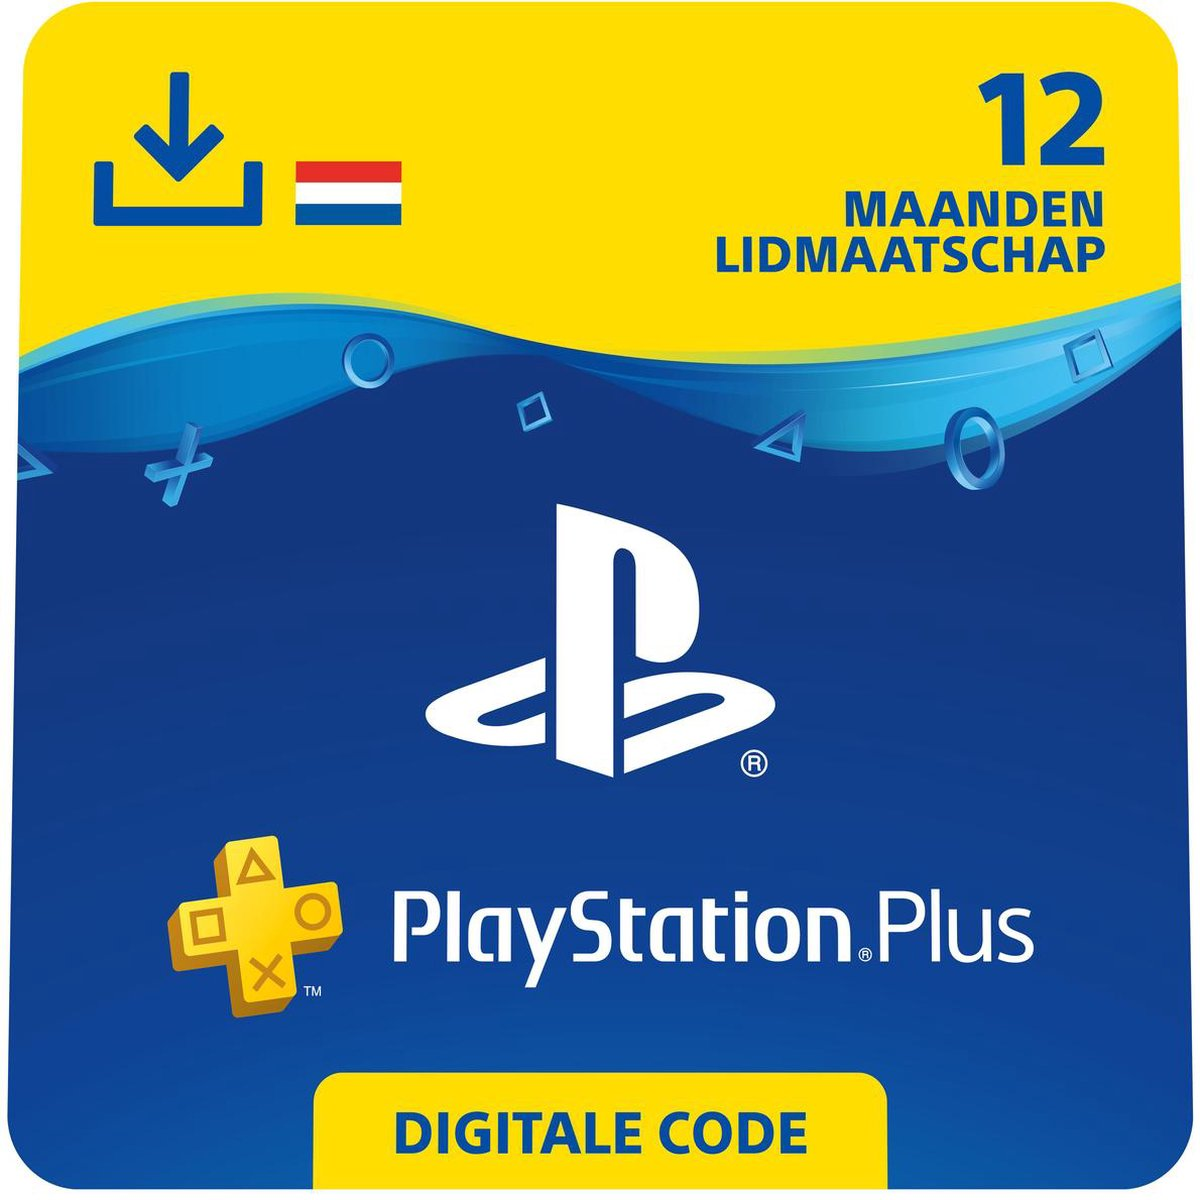 Sony Playstation Plus: 12 Maanden Lidmaatschap - PSN PlayStation Network - NL